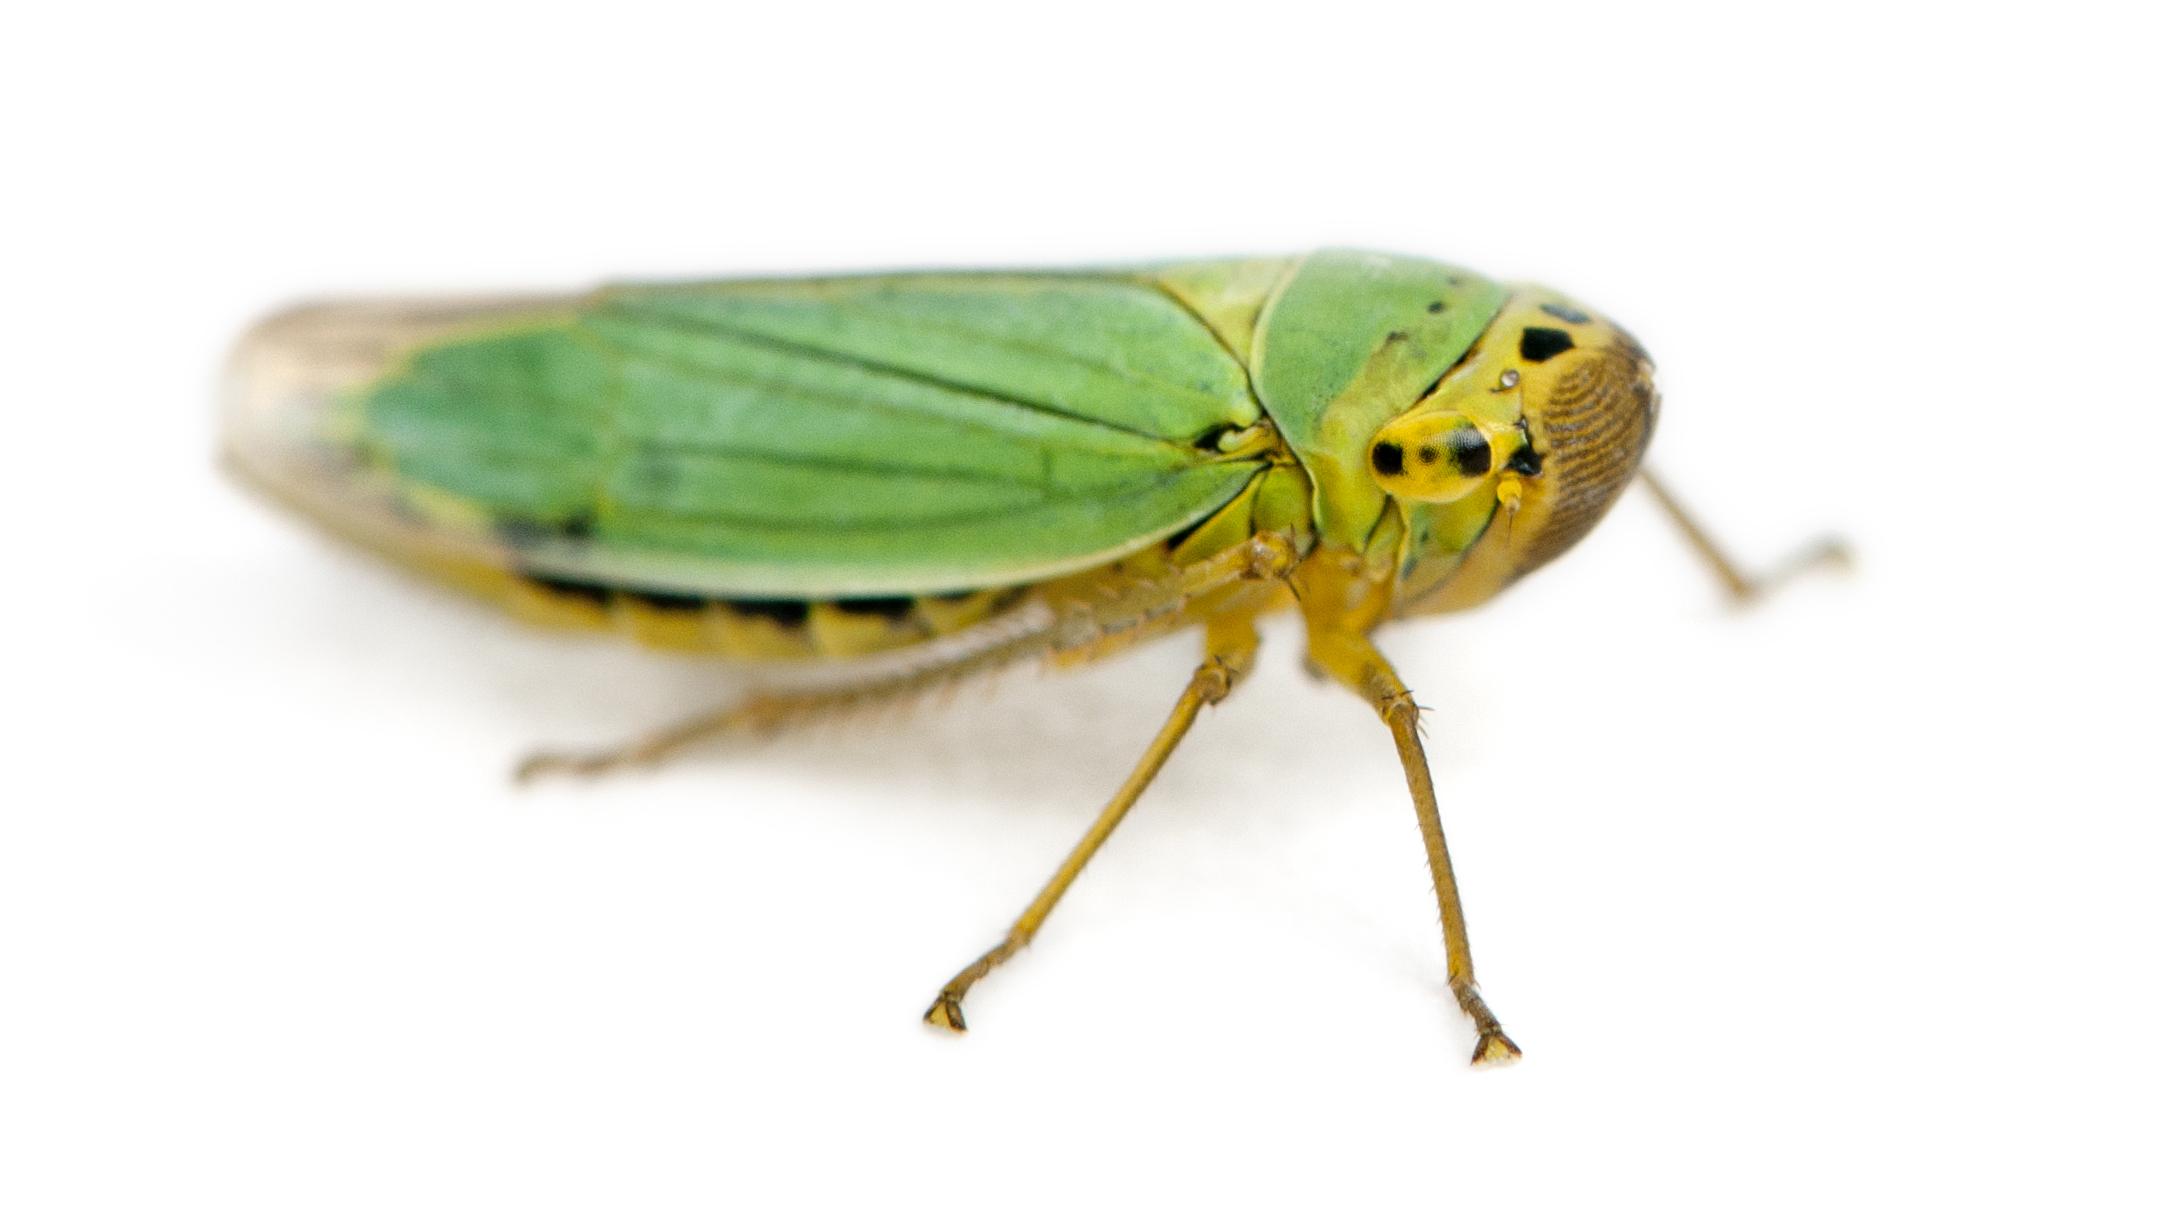 Leaf hopper photo